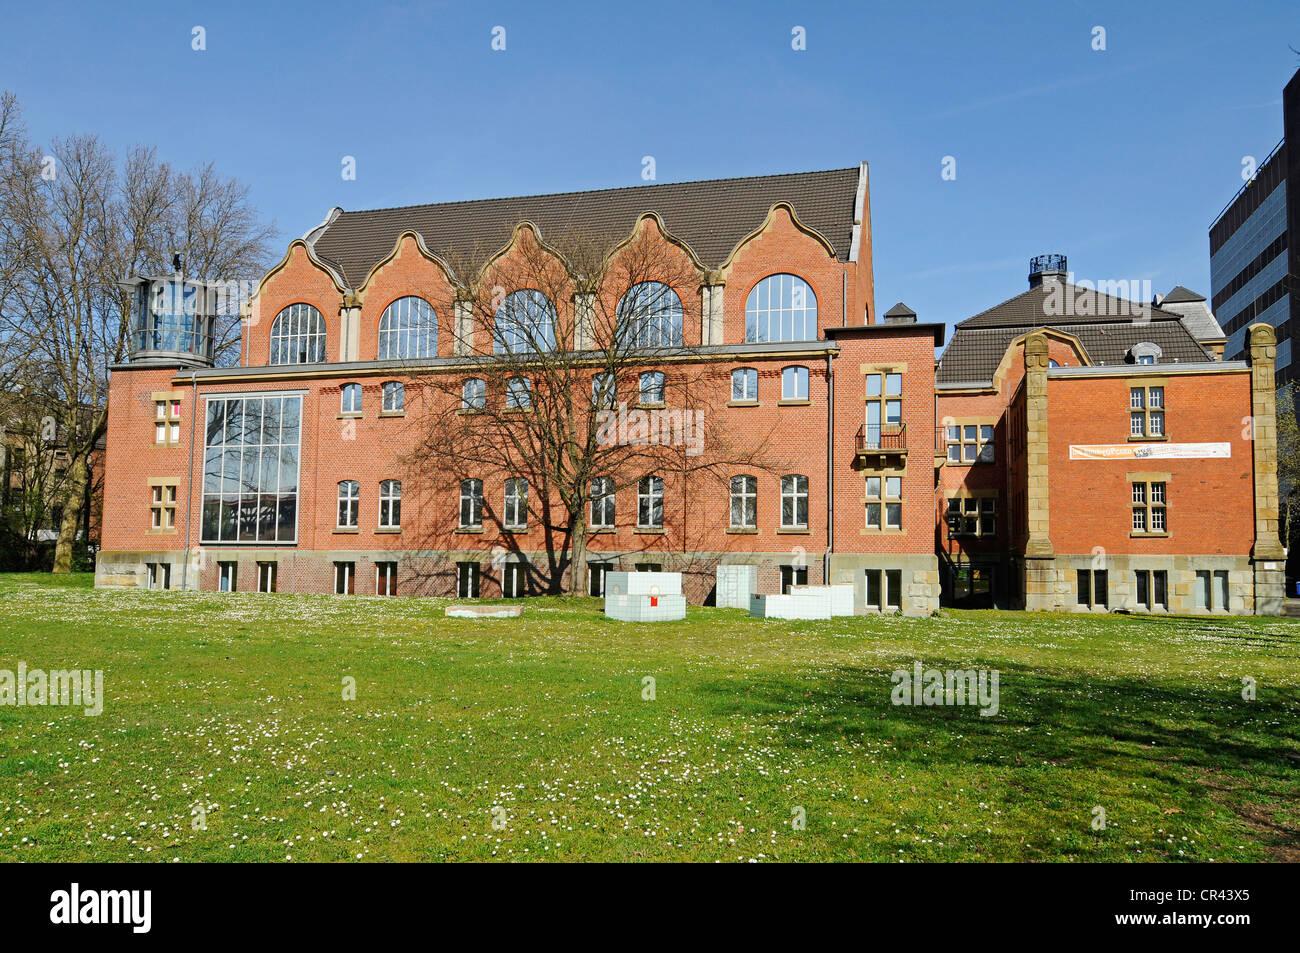 Museum of German Inland Navigation, Duisburg-Ruhrort, Duisburg, Ruhrgebiet region, North Rhine-Westphalia, Germany, Europe Stock Photo